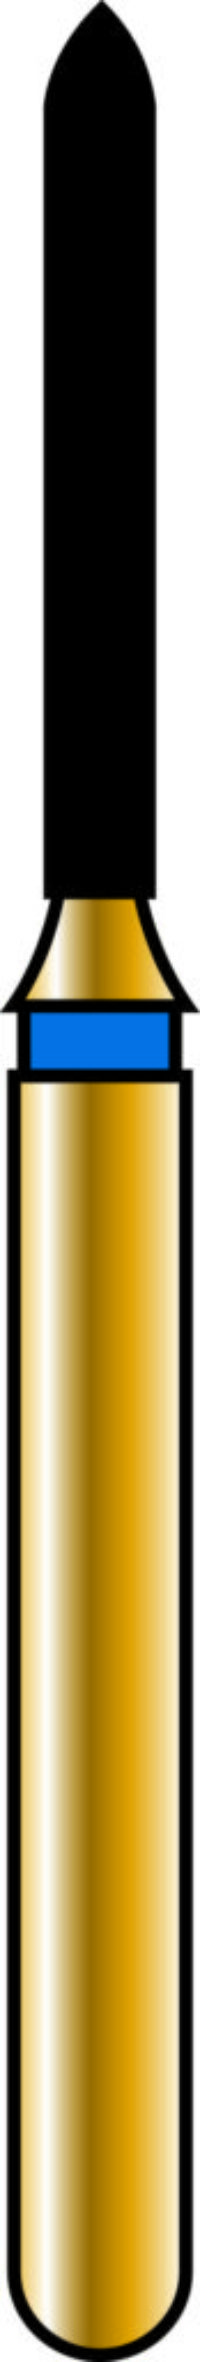 Pointed Cylinder 10-8mm Gold Diamond Bur